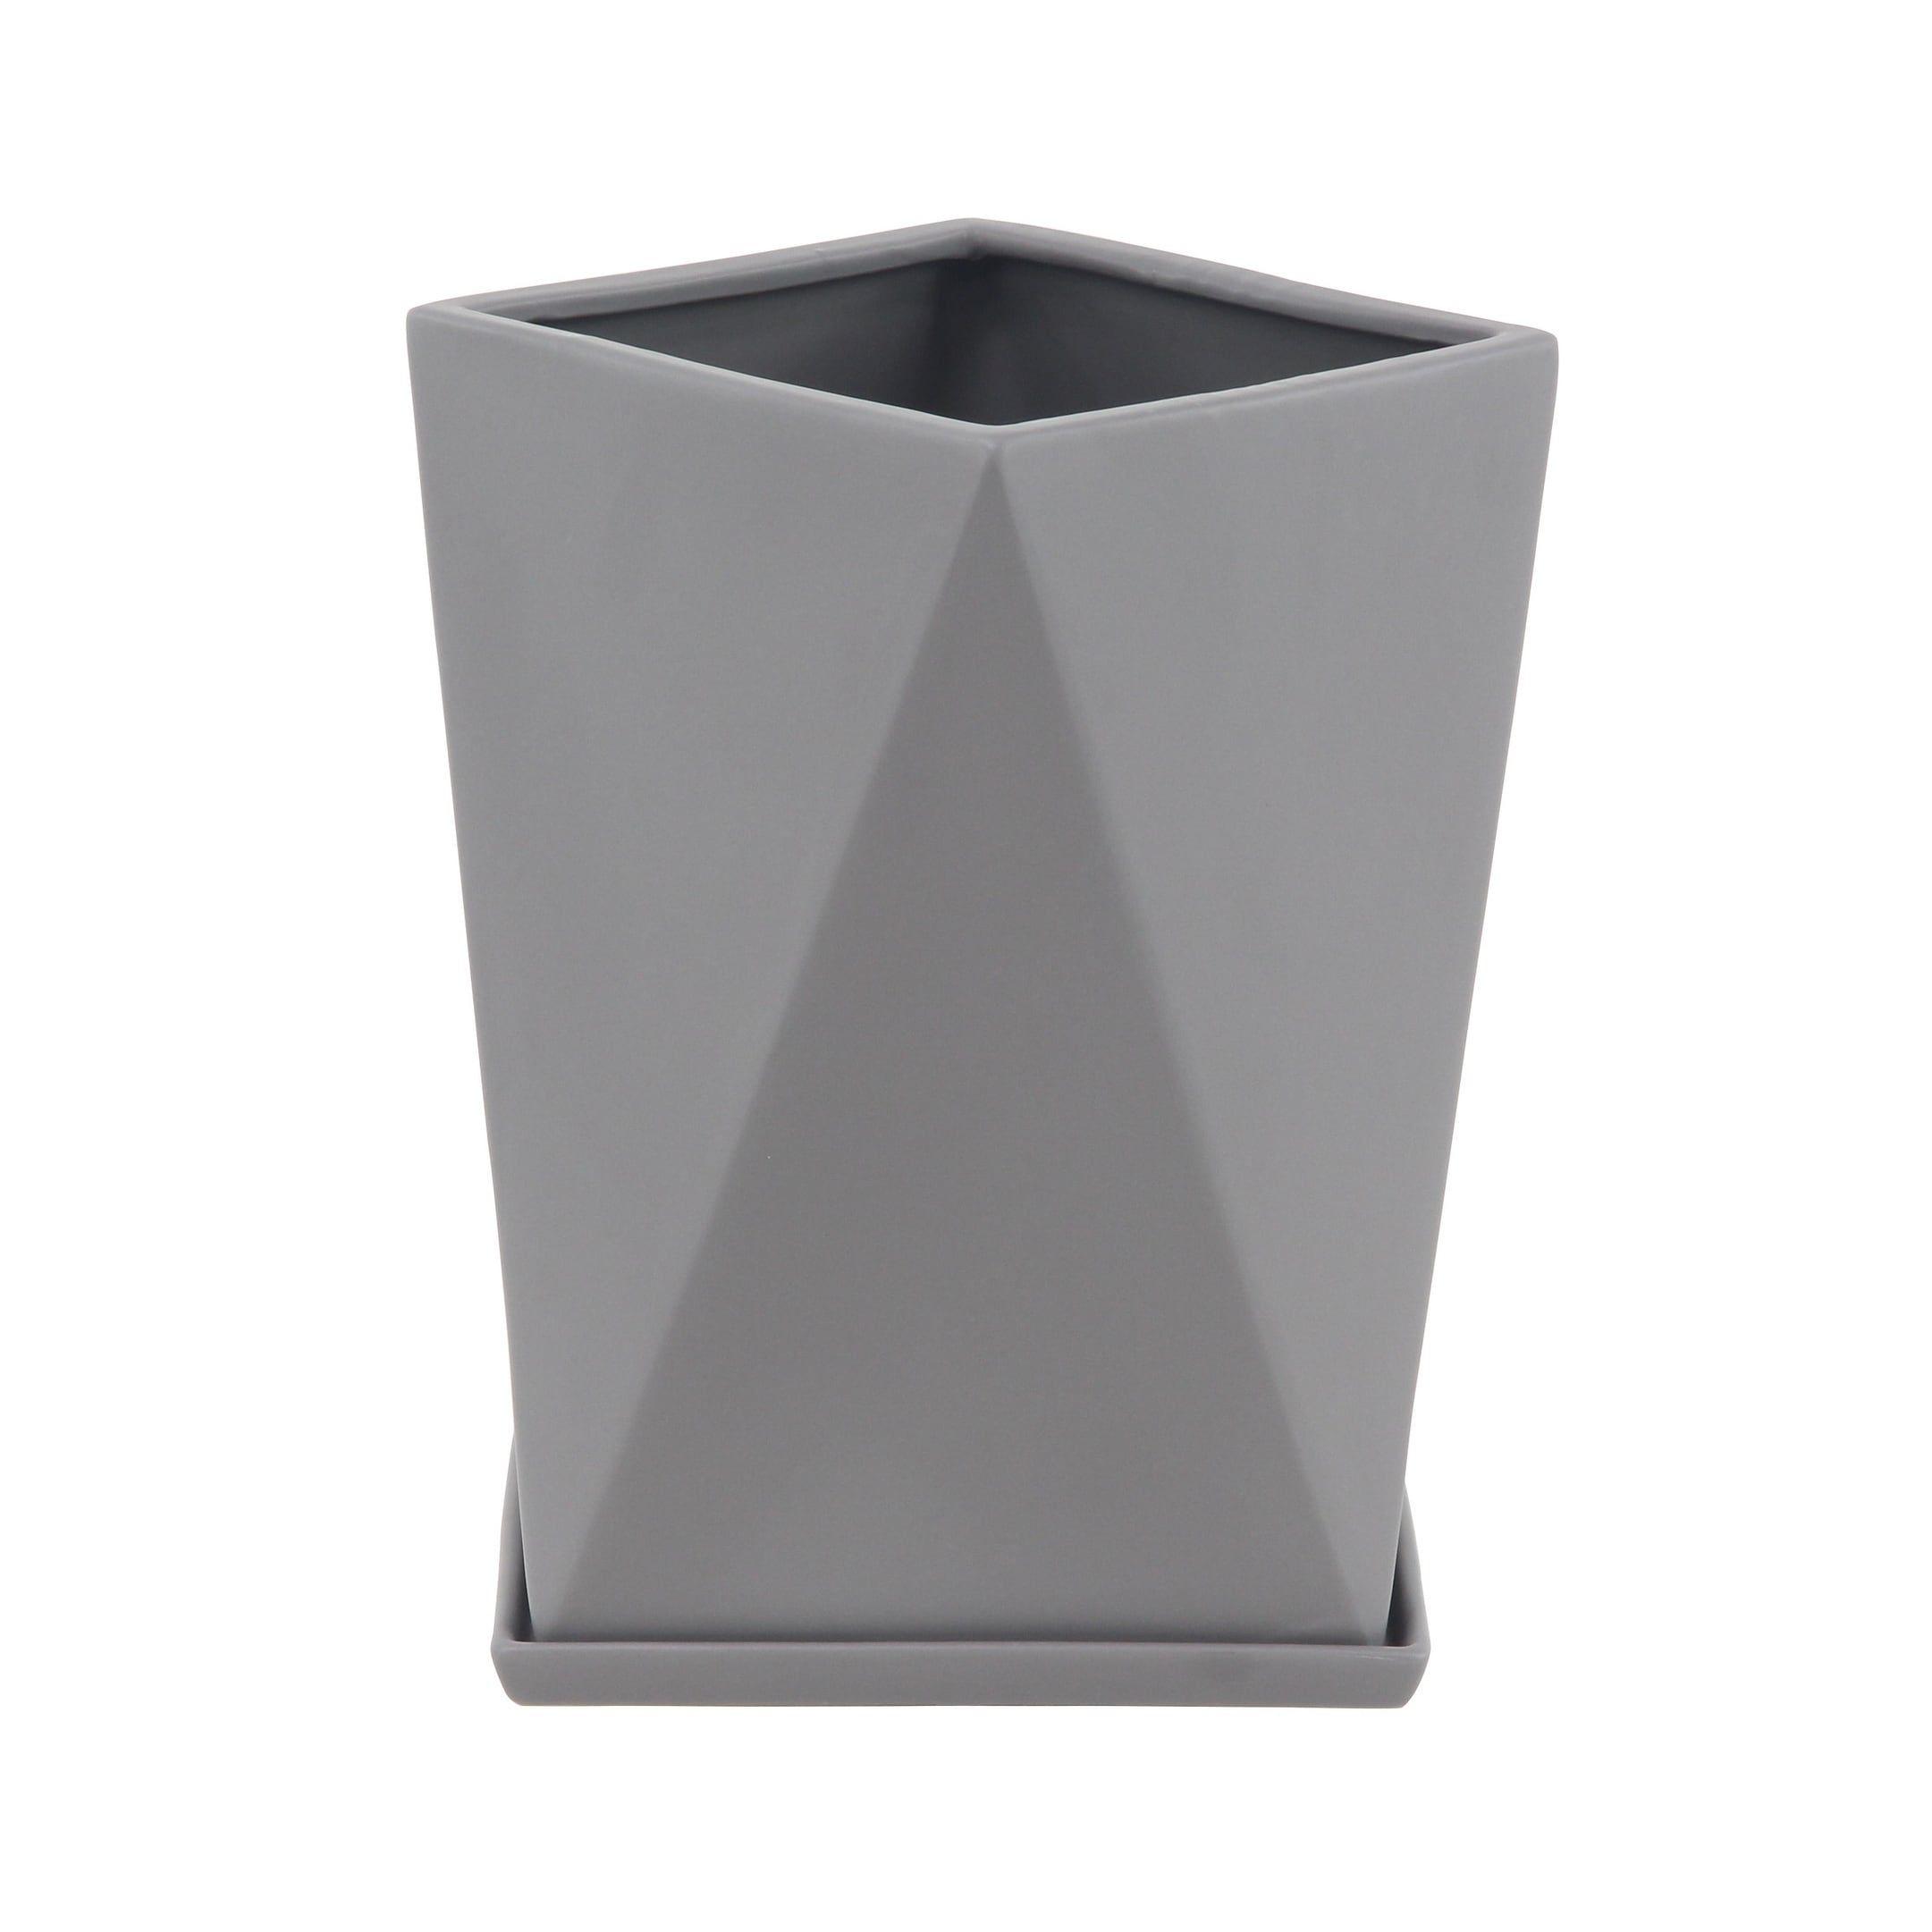 Modern Geometric Slate Gray Ceramic Indoor & Outdoor Planter 12″ x 13″, Outdoor Décor